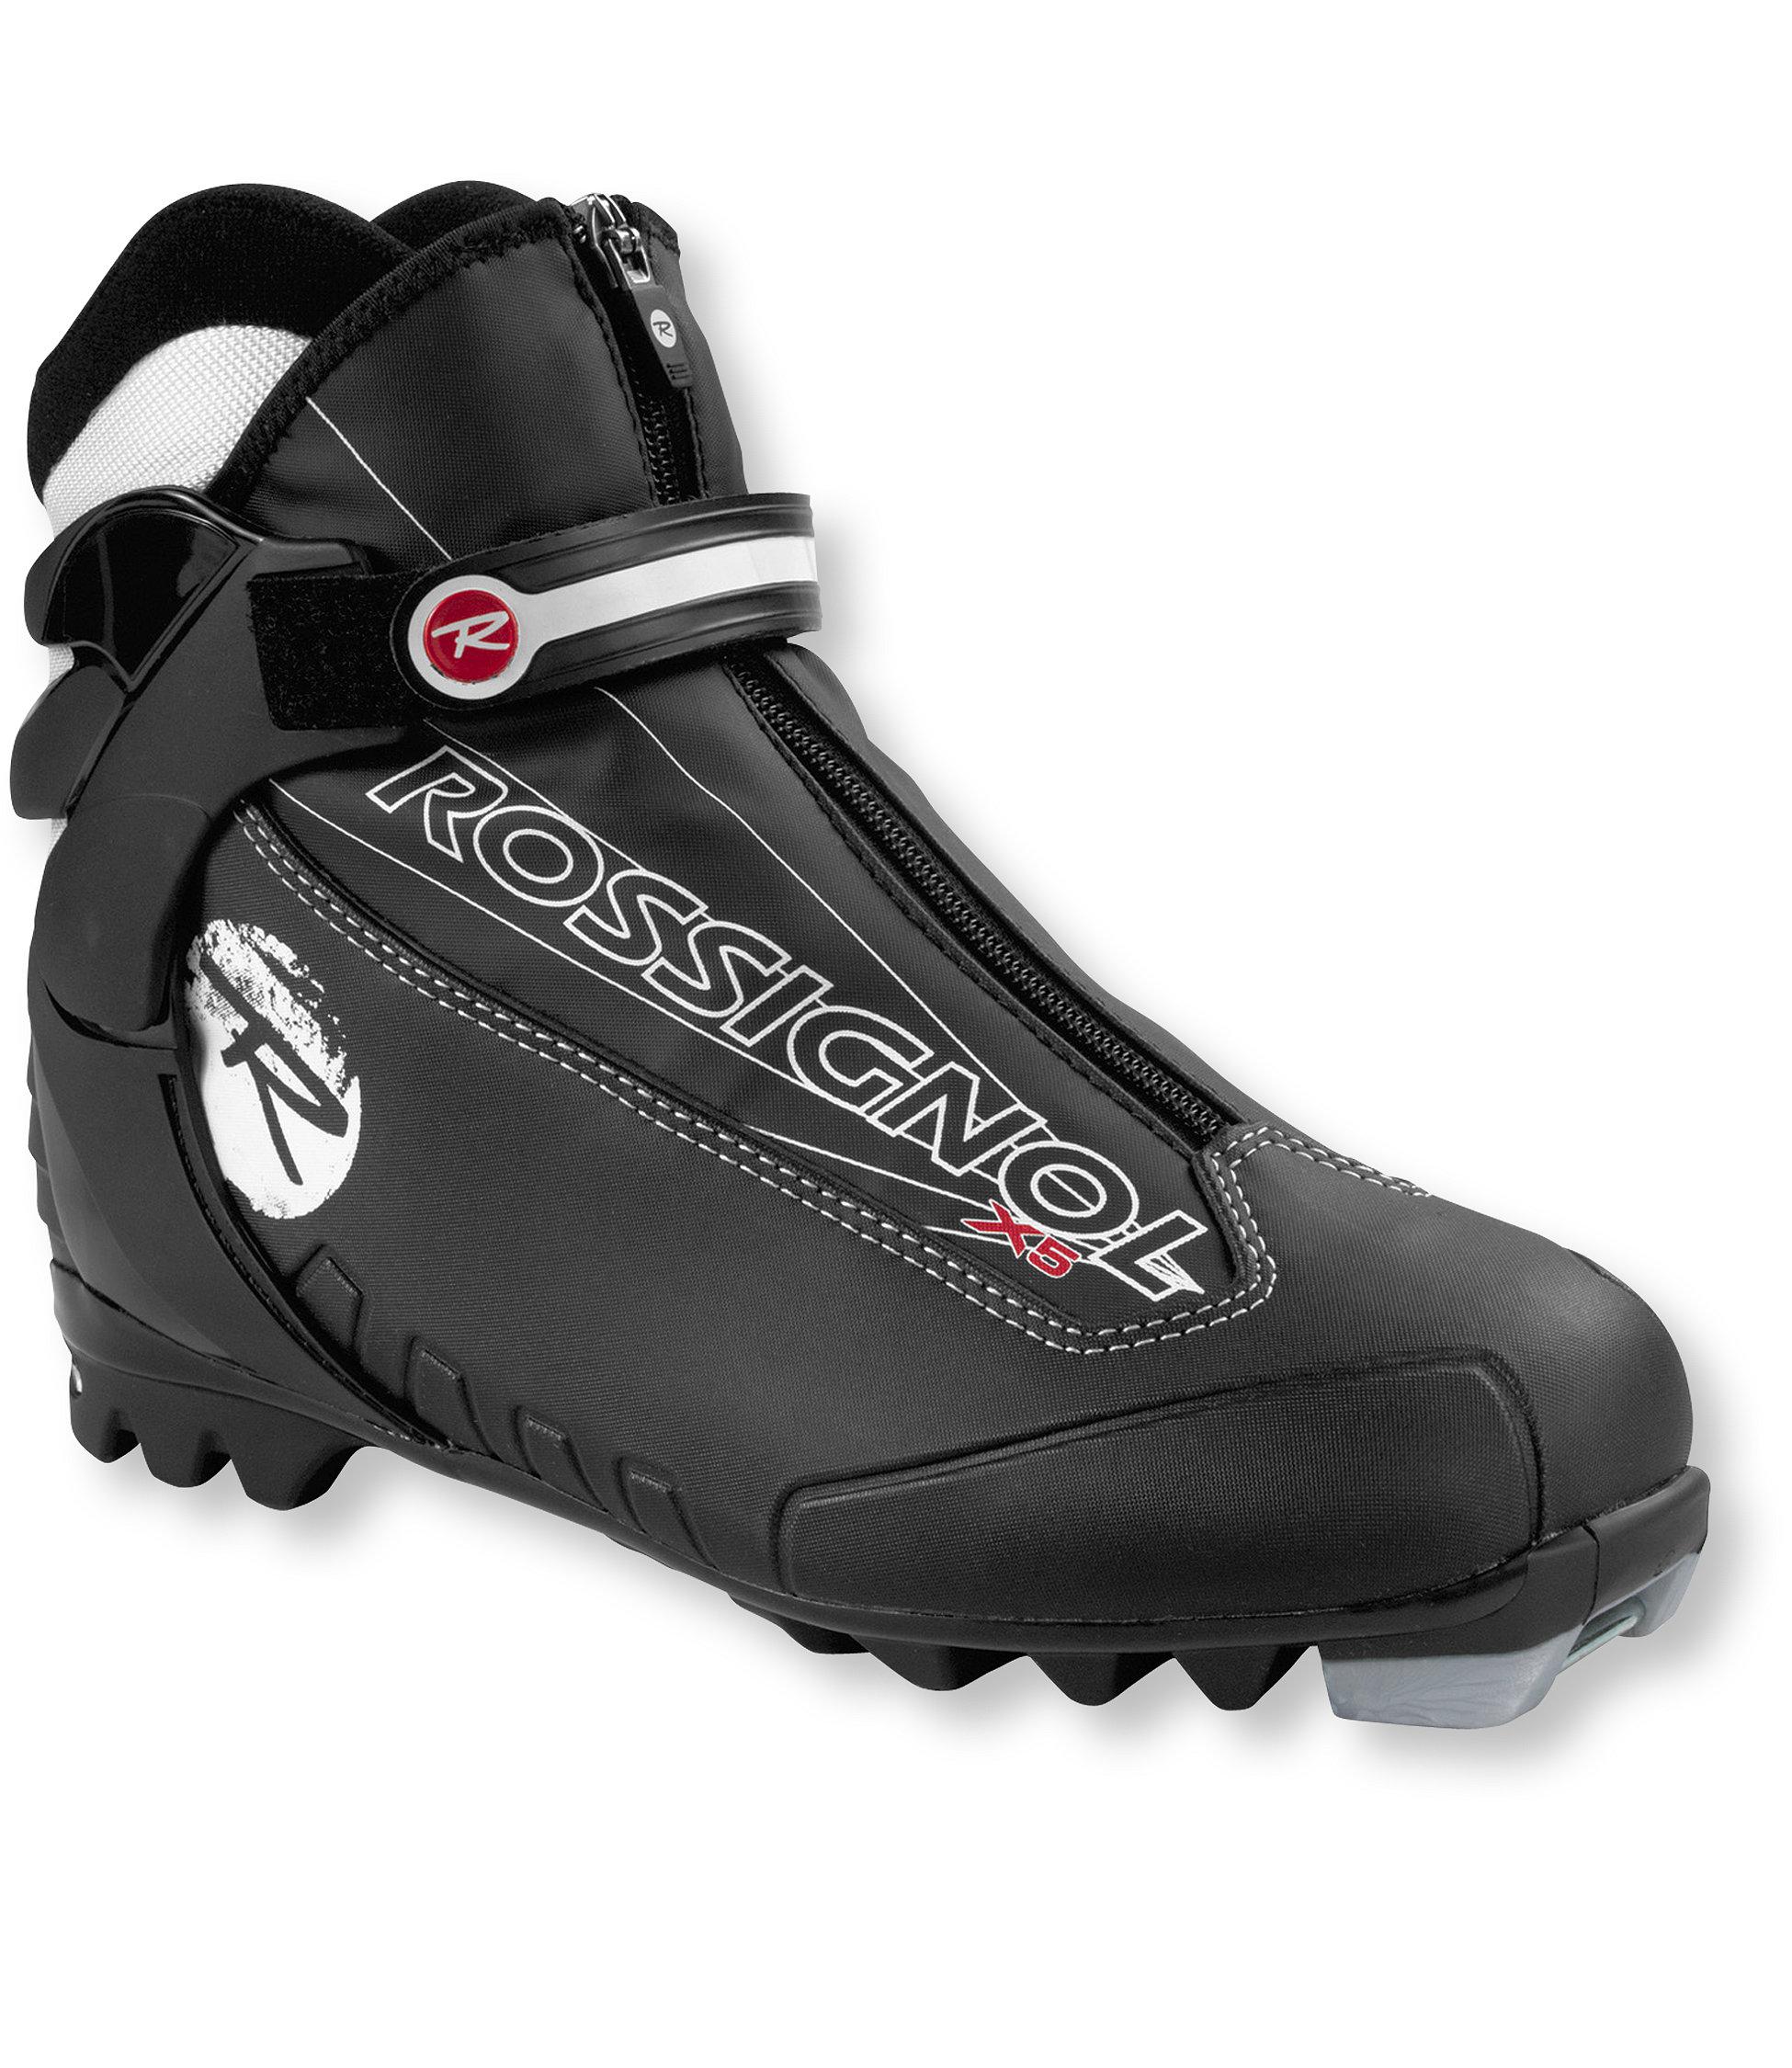 photo: Rossignol Women's X5 Ski Boots nordic touring boot